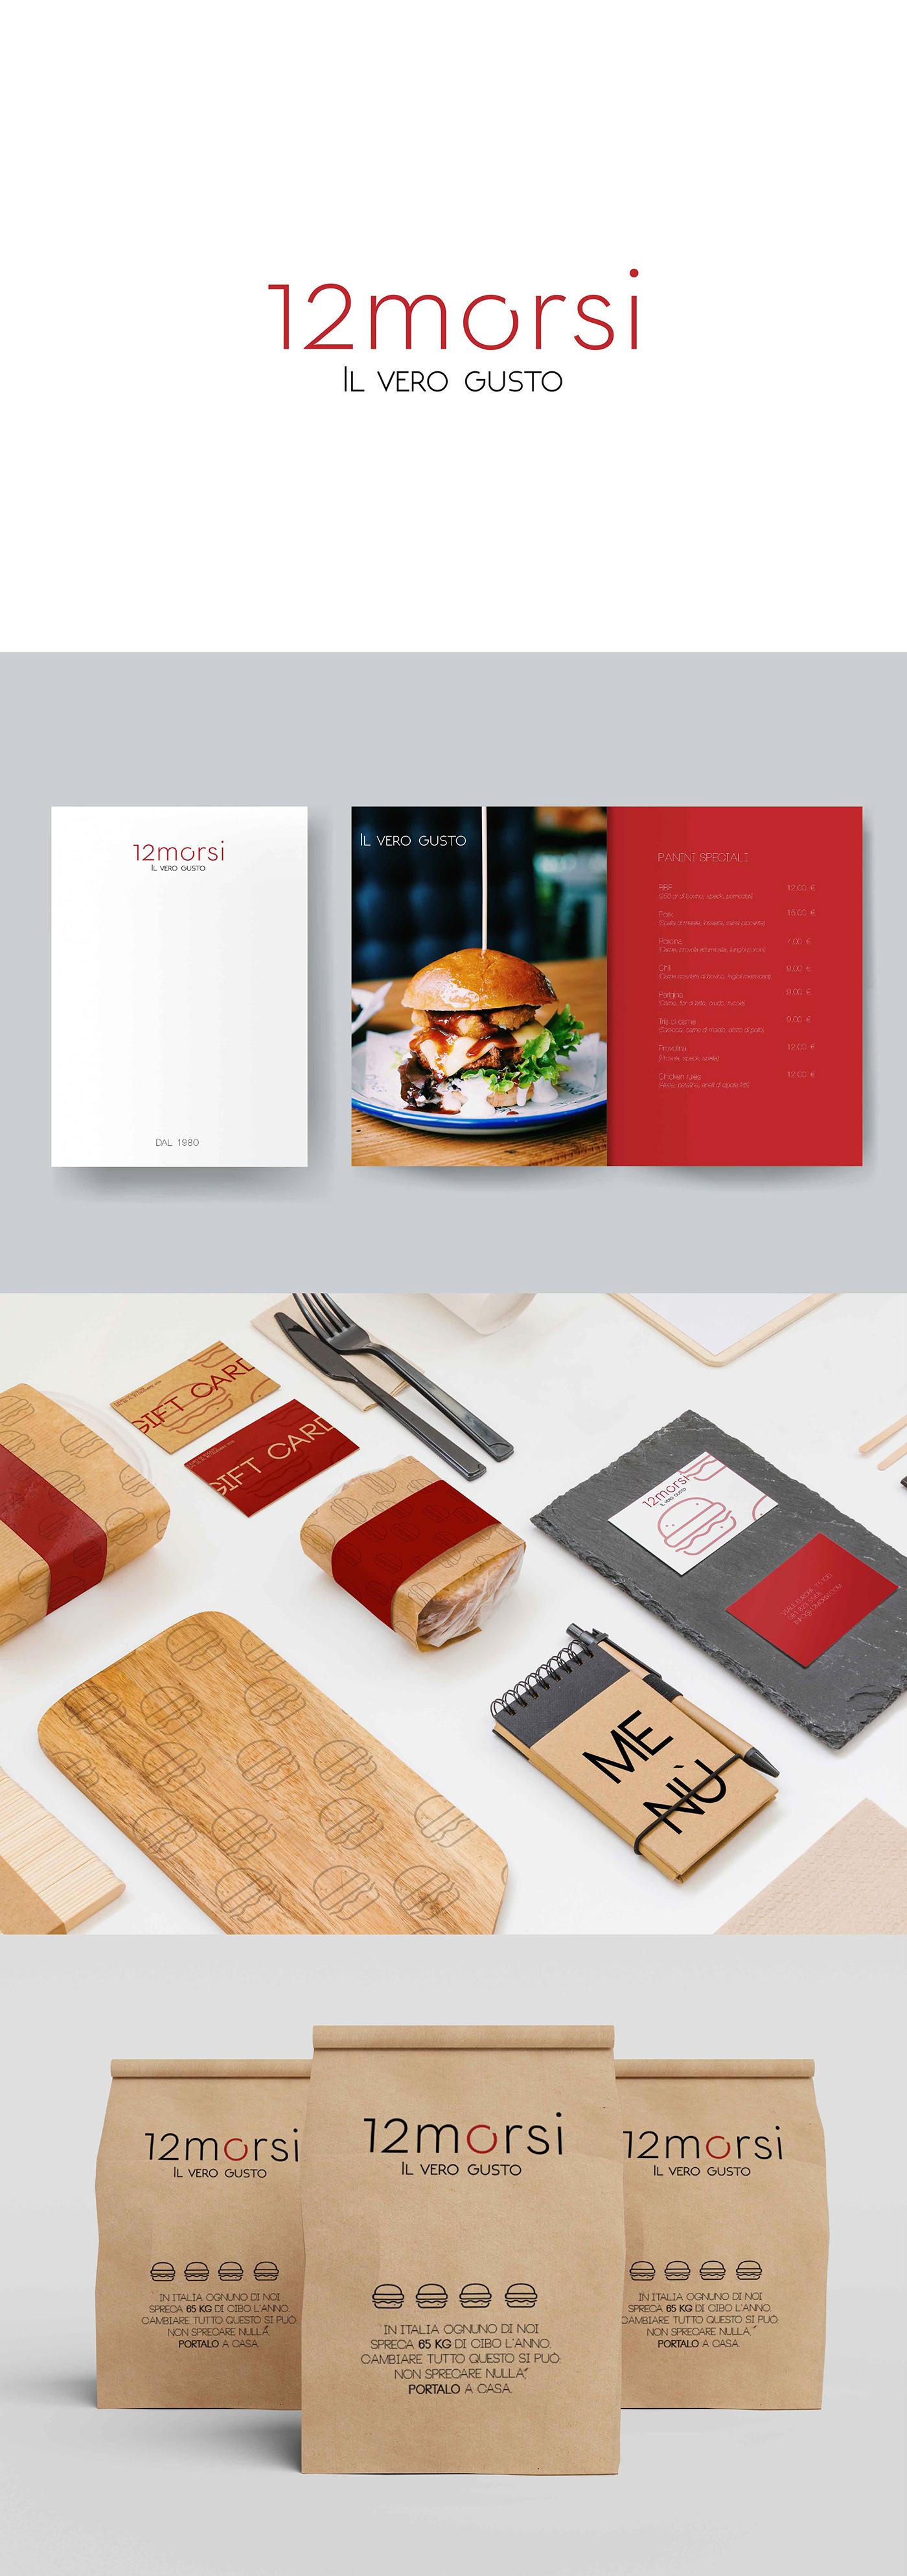 Image may contain: fast food, food and menu